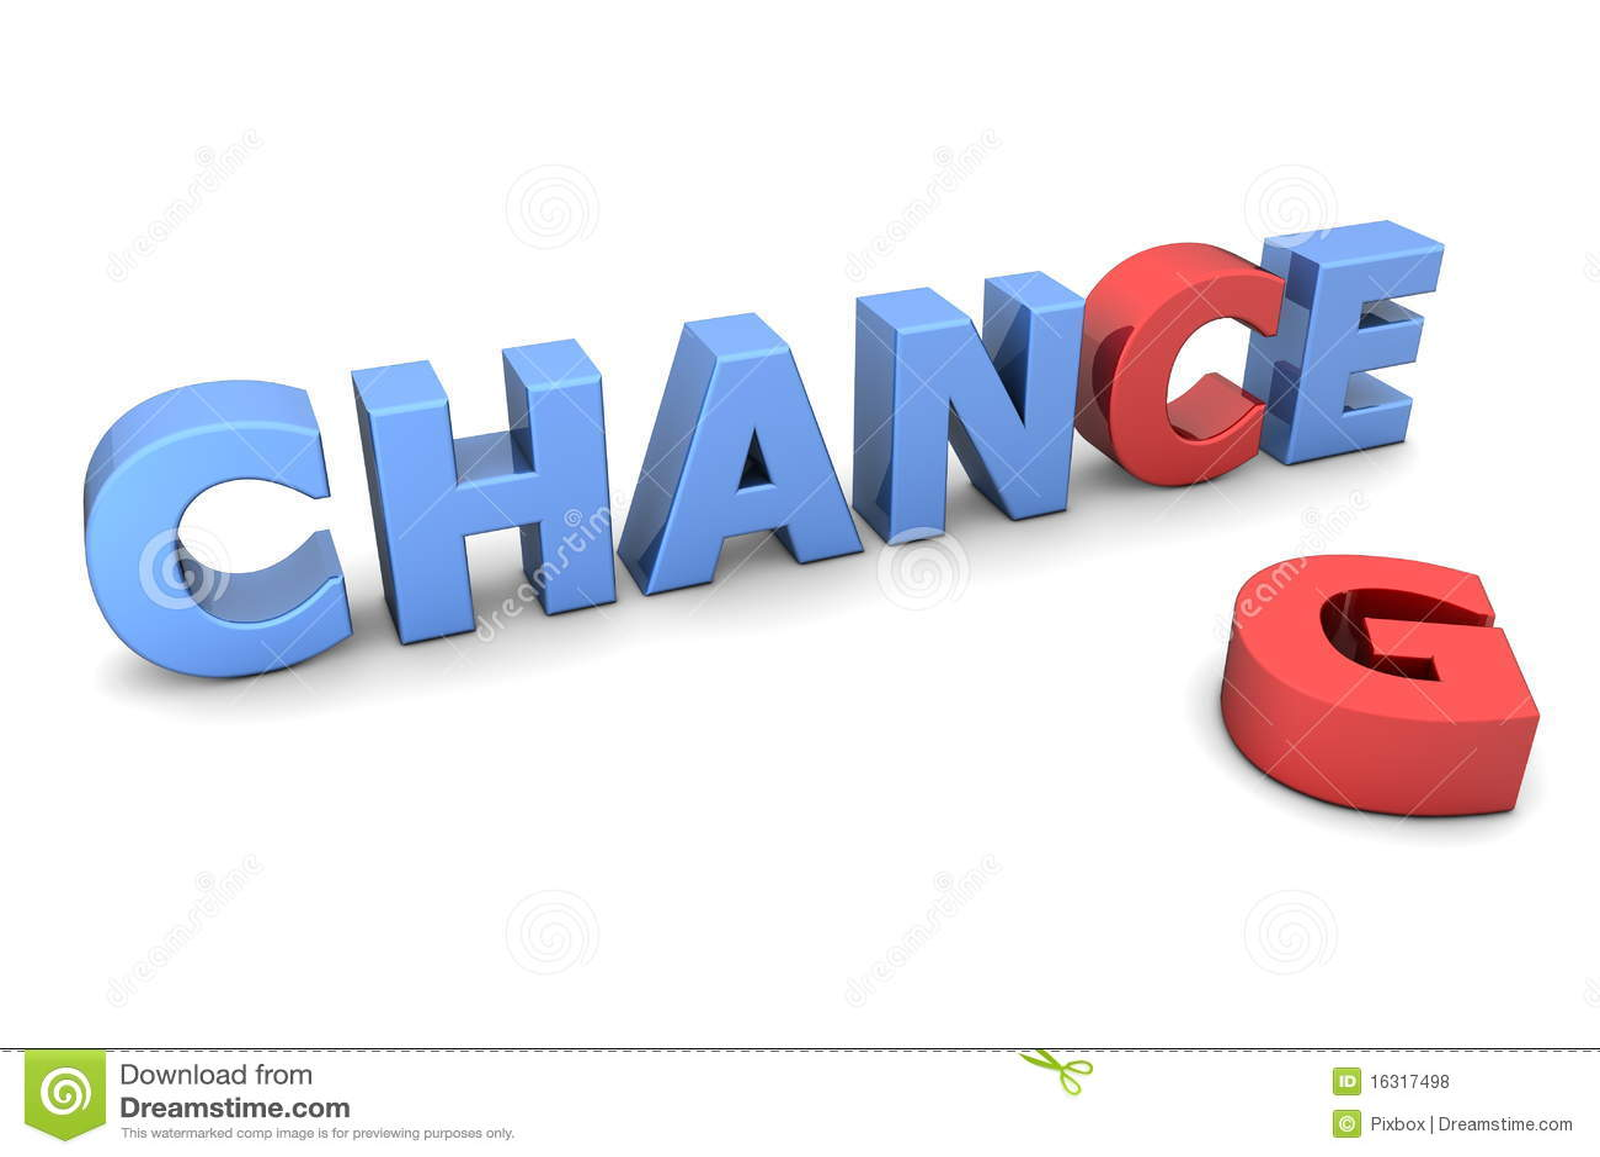 Chance Net Worth